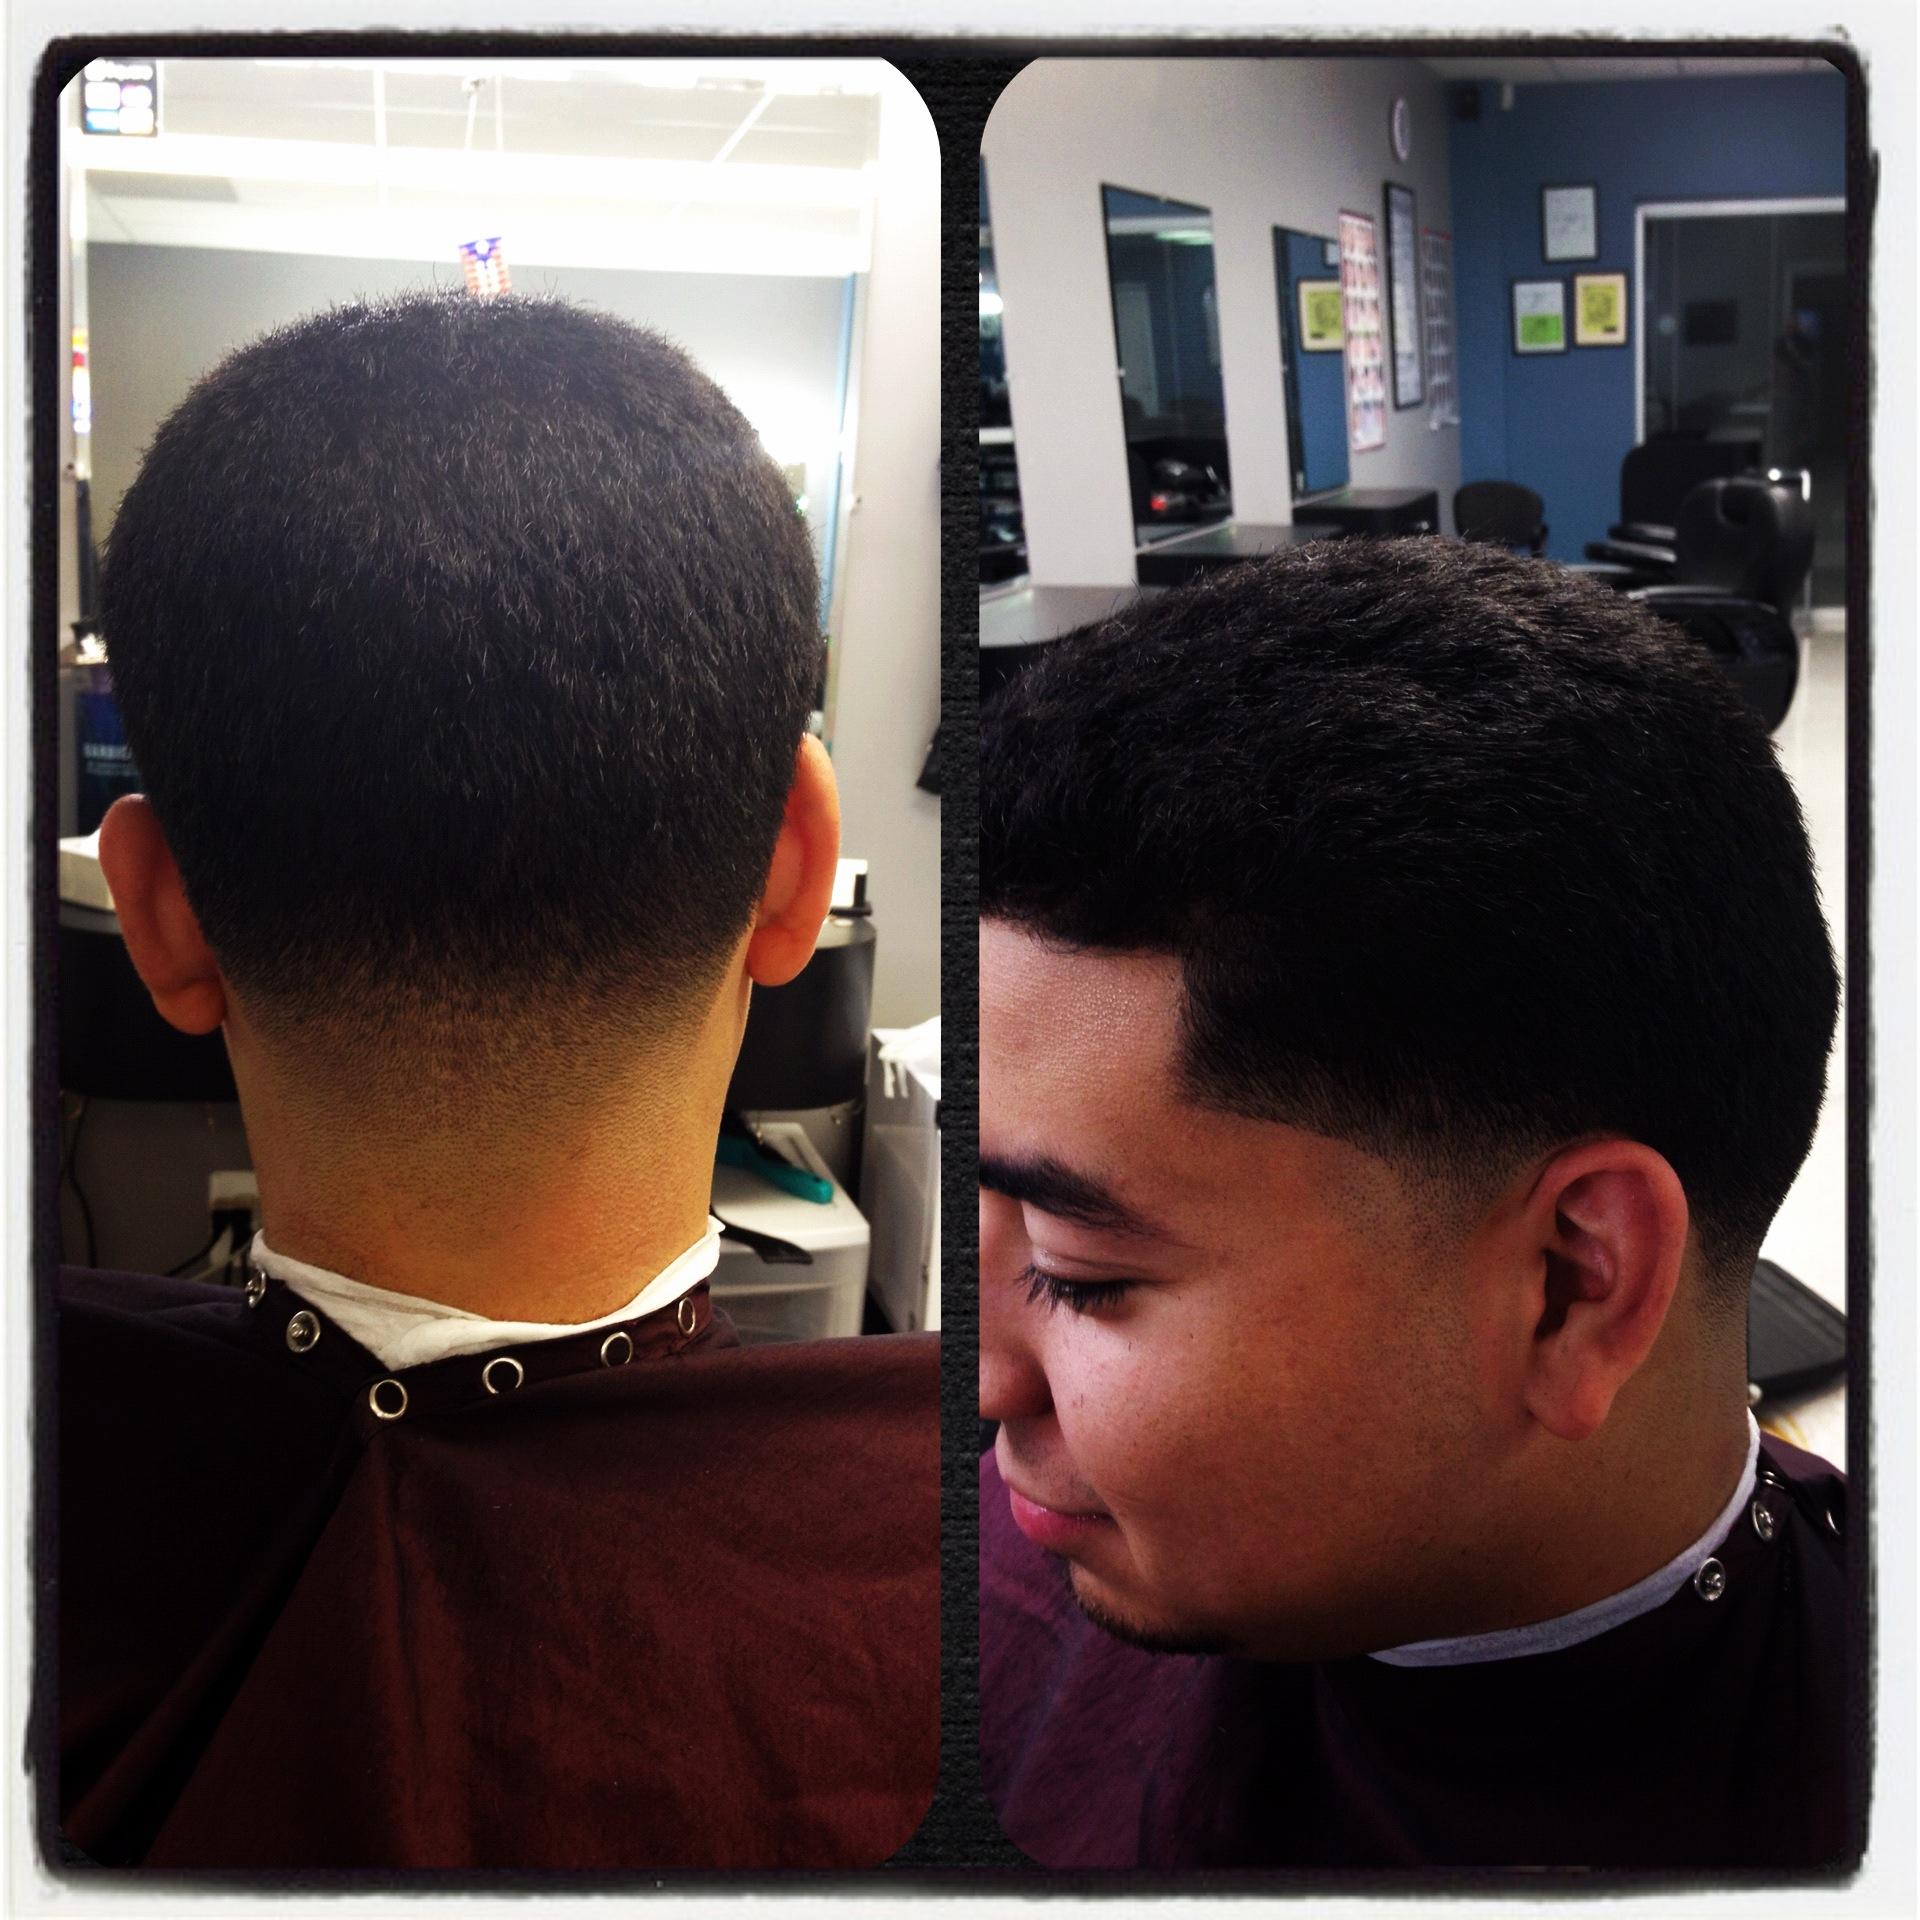 ... - What Is A Taper Fade Http Bertothebarber Com Haircut Taper Fade